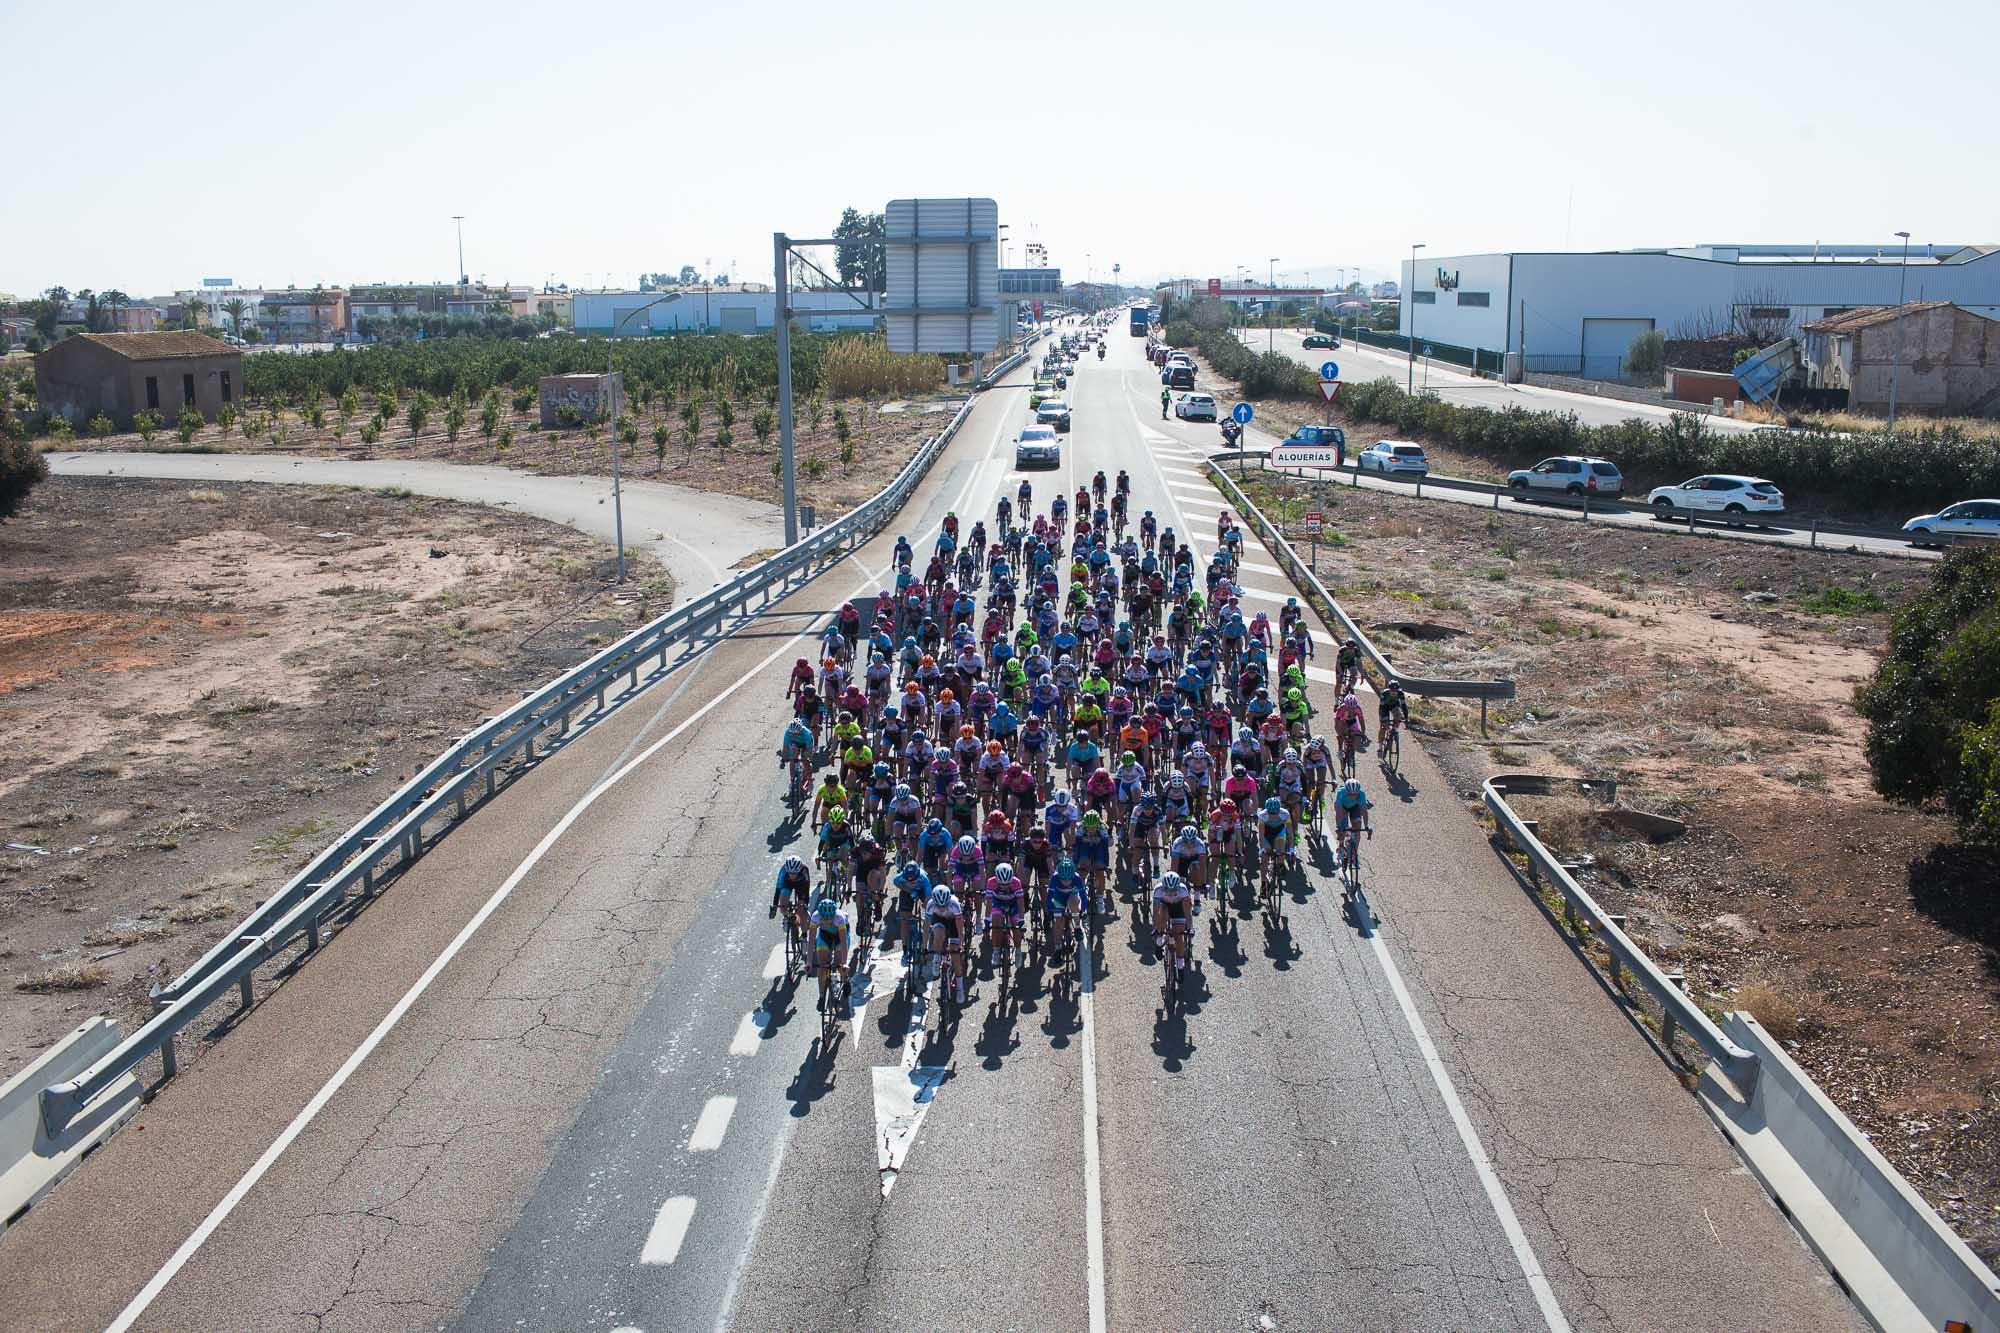 2018 Setmana Ciclista Valenciana - Stage 2